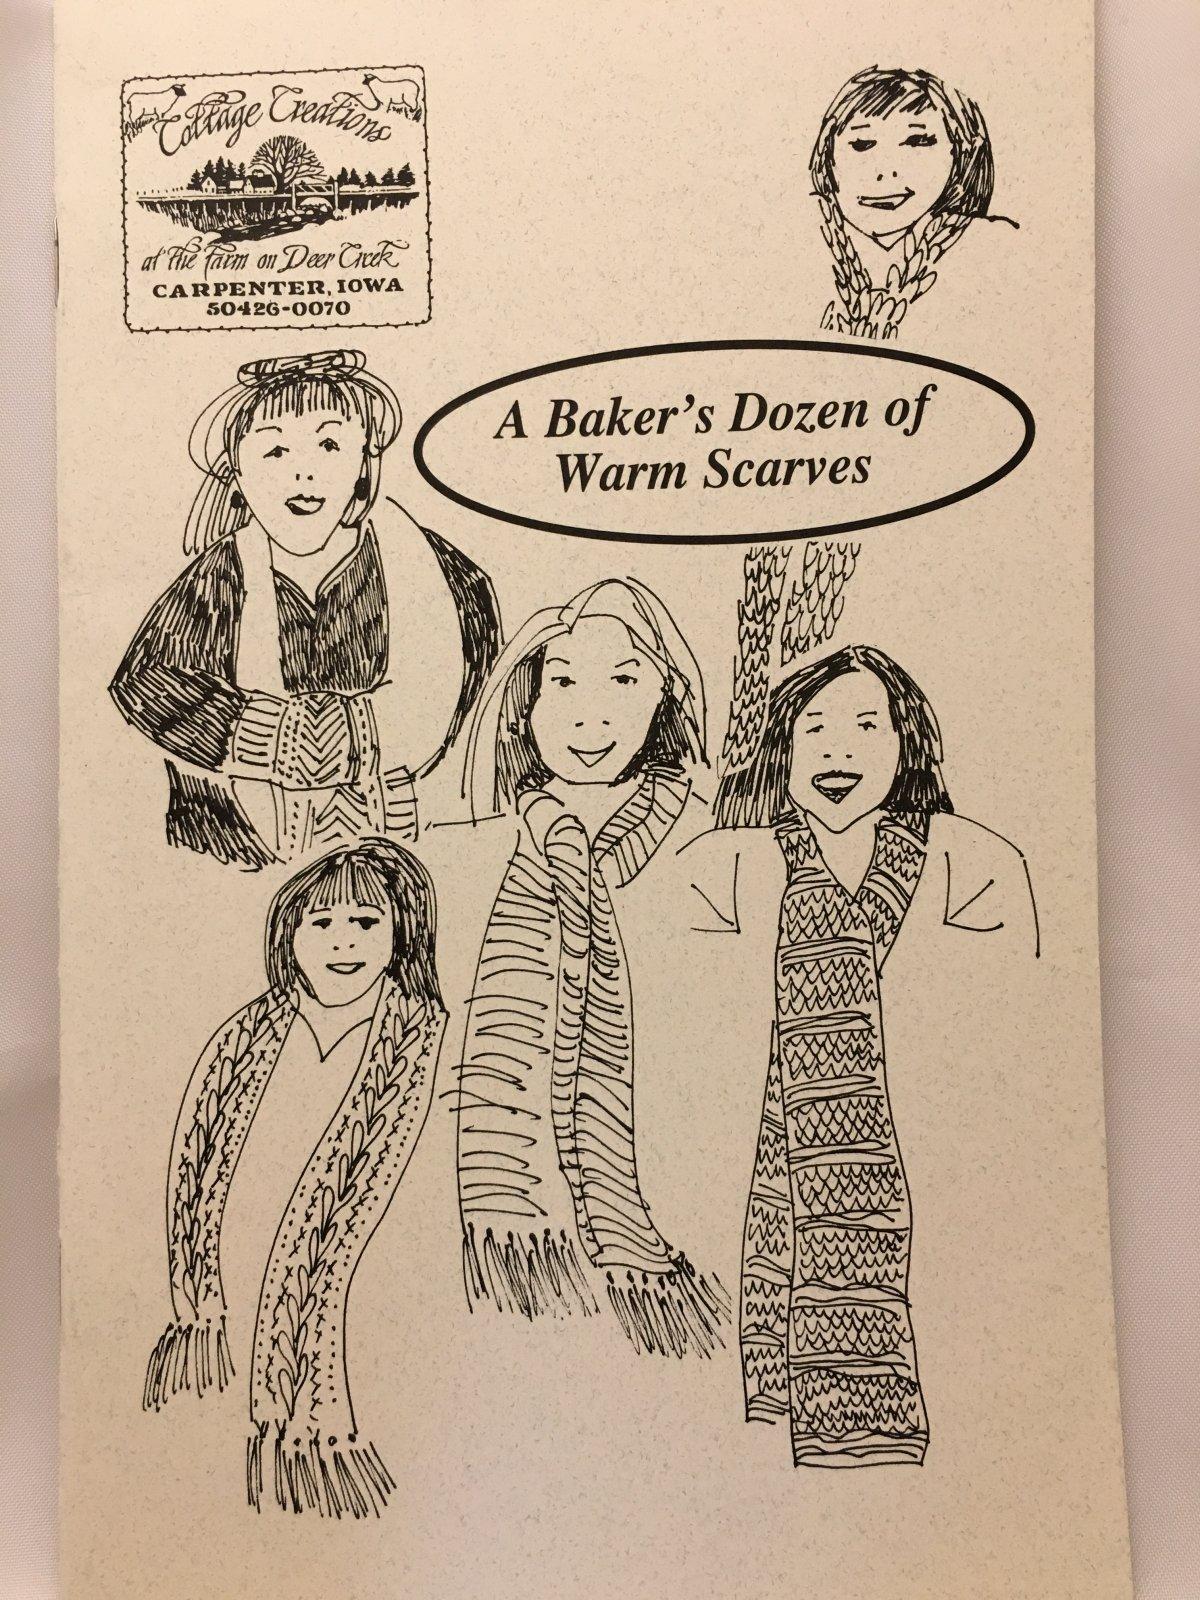 A Bakers Dozen of Warm Scarves